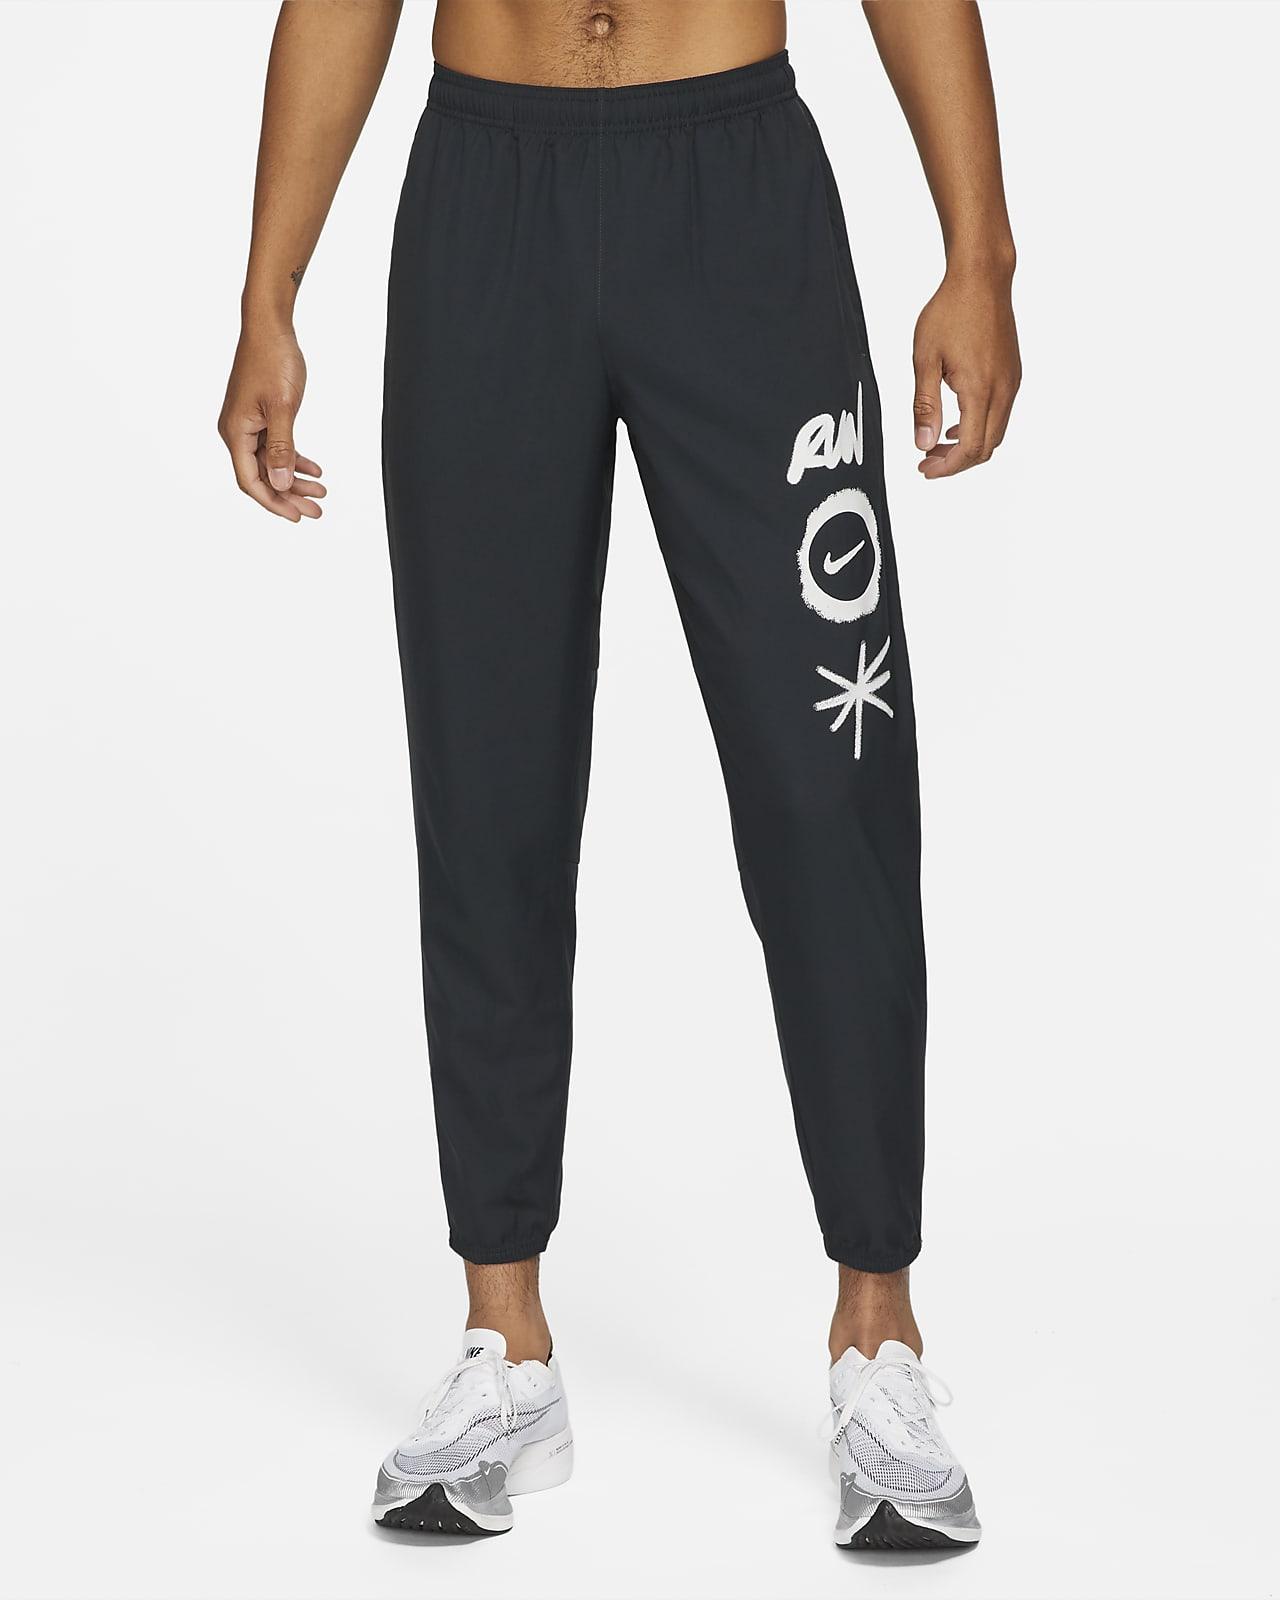 Pantalones tejidos de running para hombre Nike Dri-FIT Challenger Wild Run